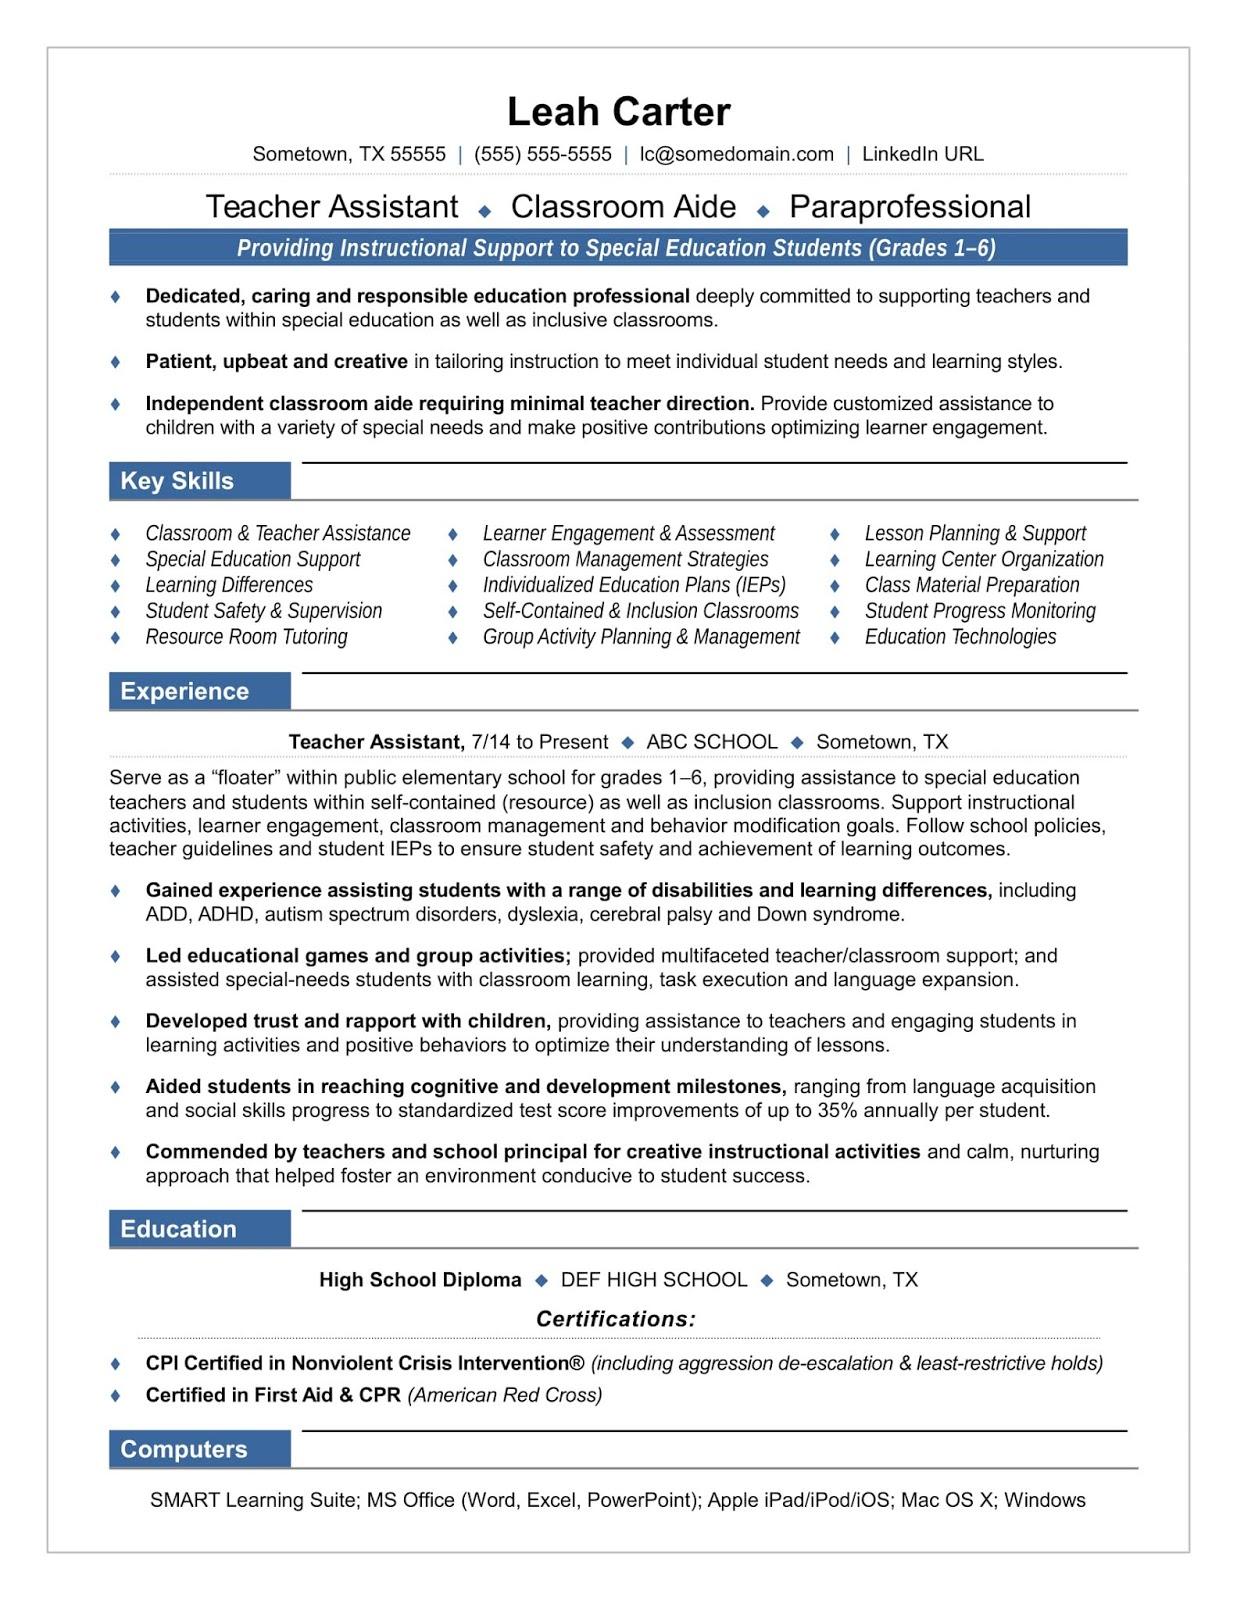 paraeducator resume sample paraeducator resume samples 2019 paraeducator resume examples paraeducator resume objective samples 2020 sample resume for paraeducator